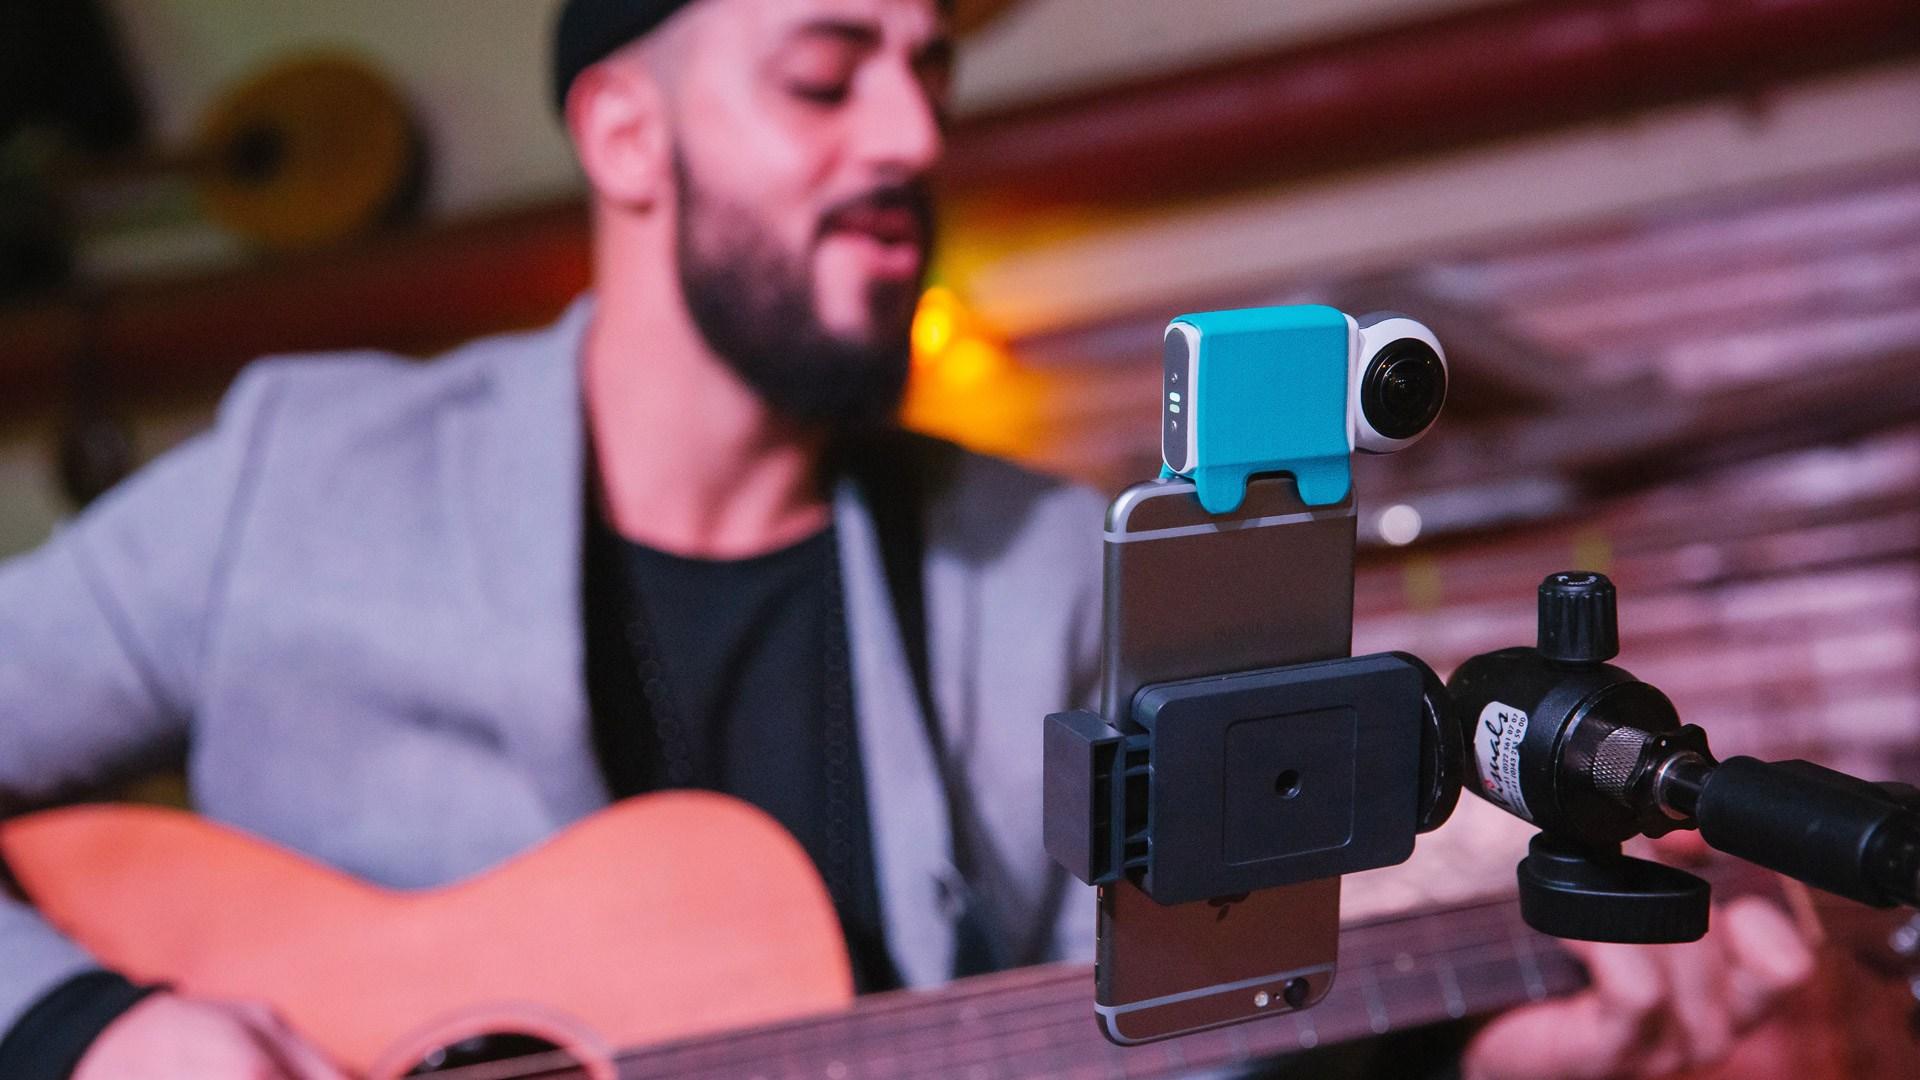 giroptic-io-360-camera-for-iphone-2